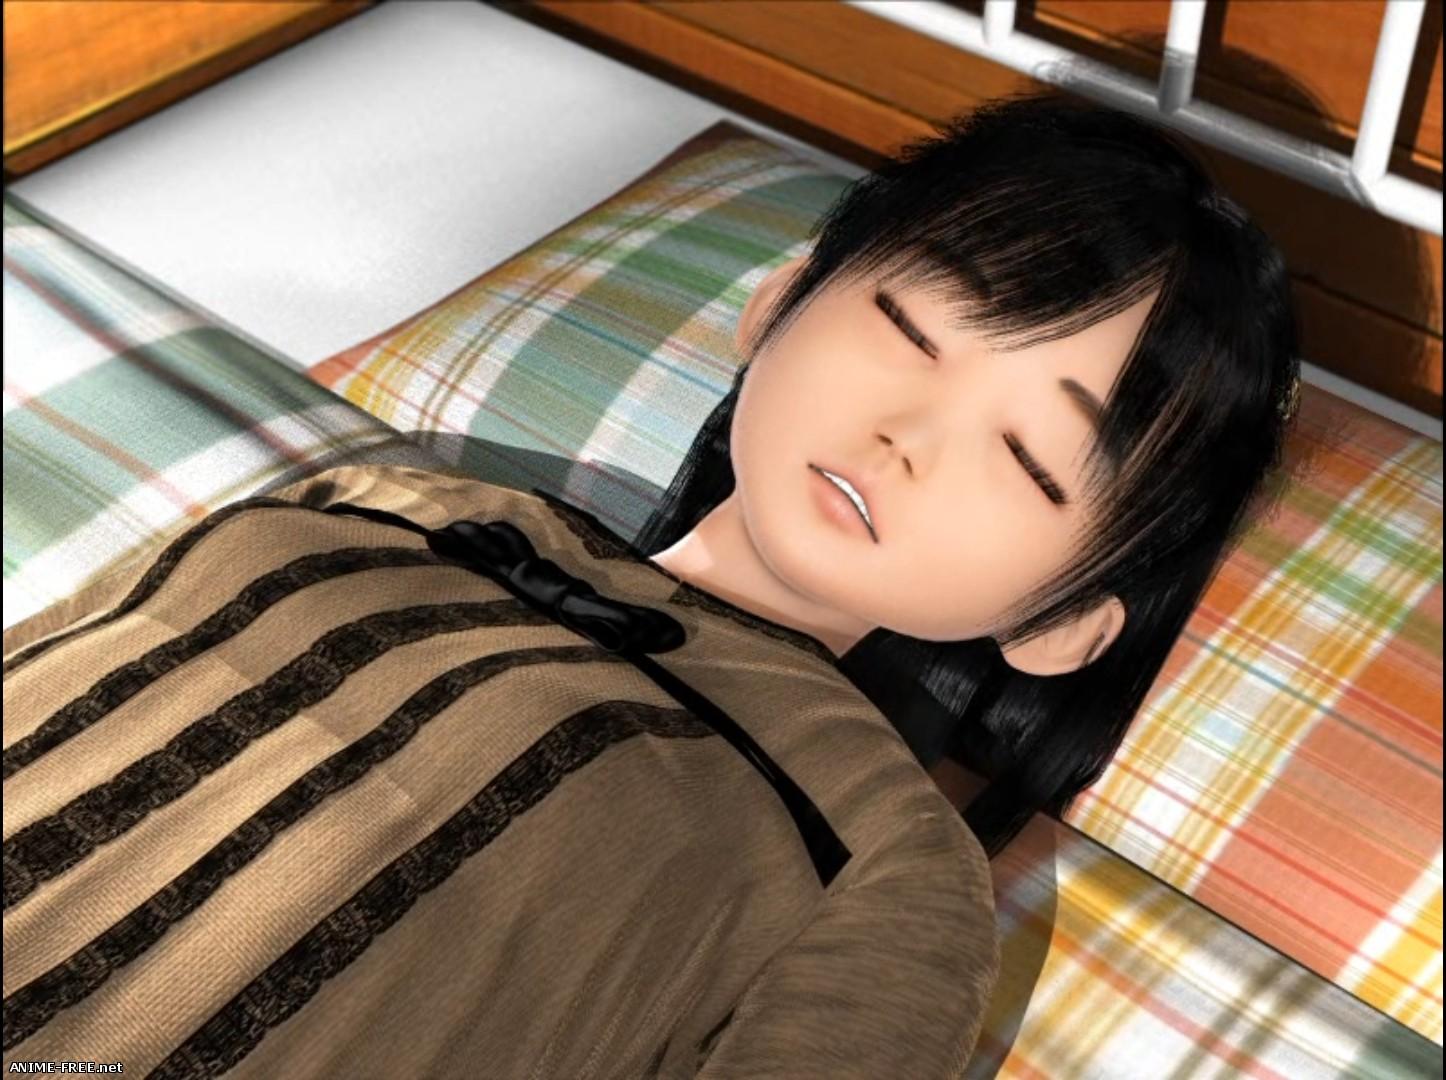 Ecchi Secret Kichi 2 / Тайный притон разврата 2 [2013] [Cen] [3DCG, Animation] [RUS,JAP] H-Game